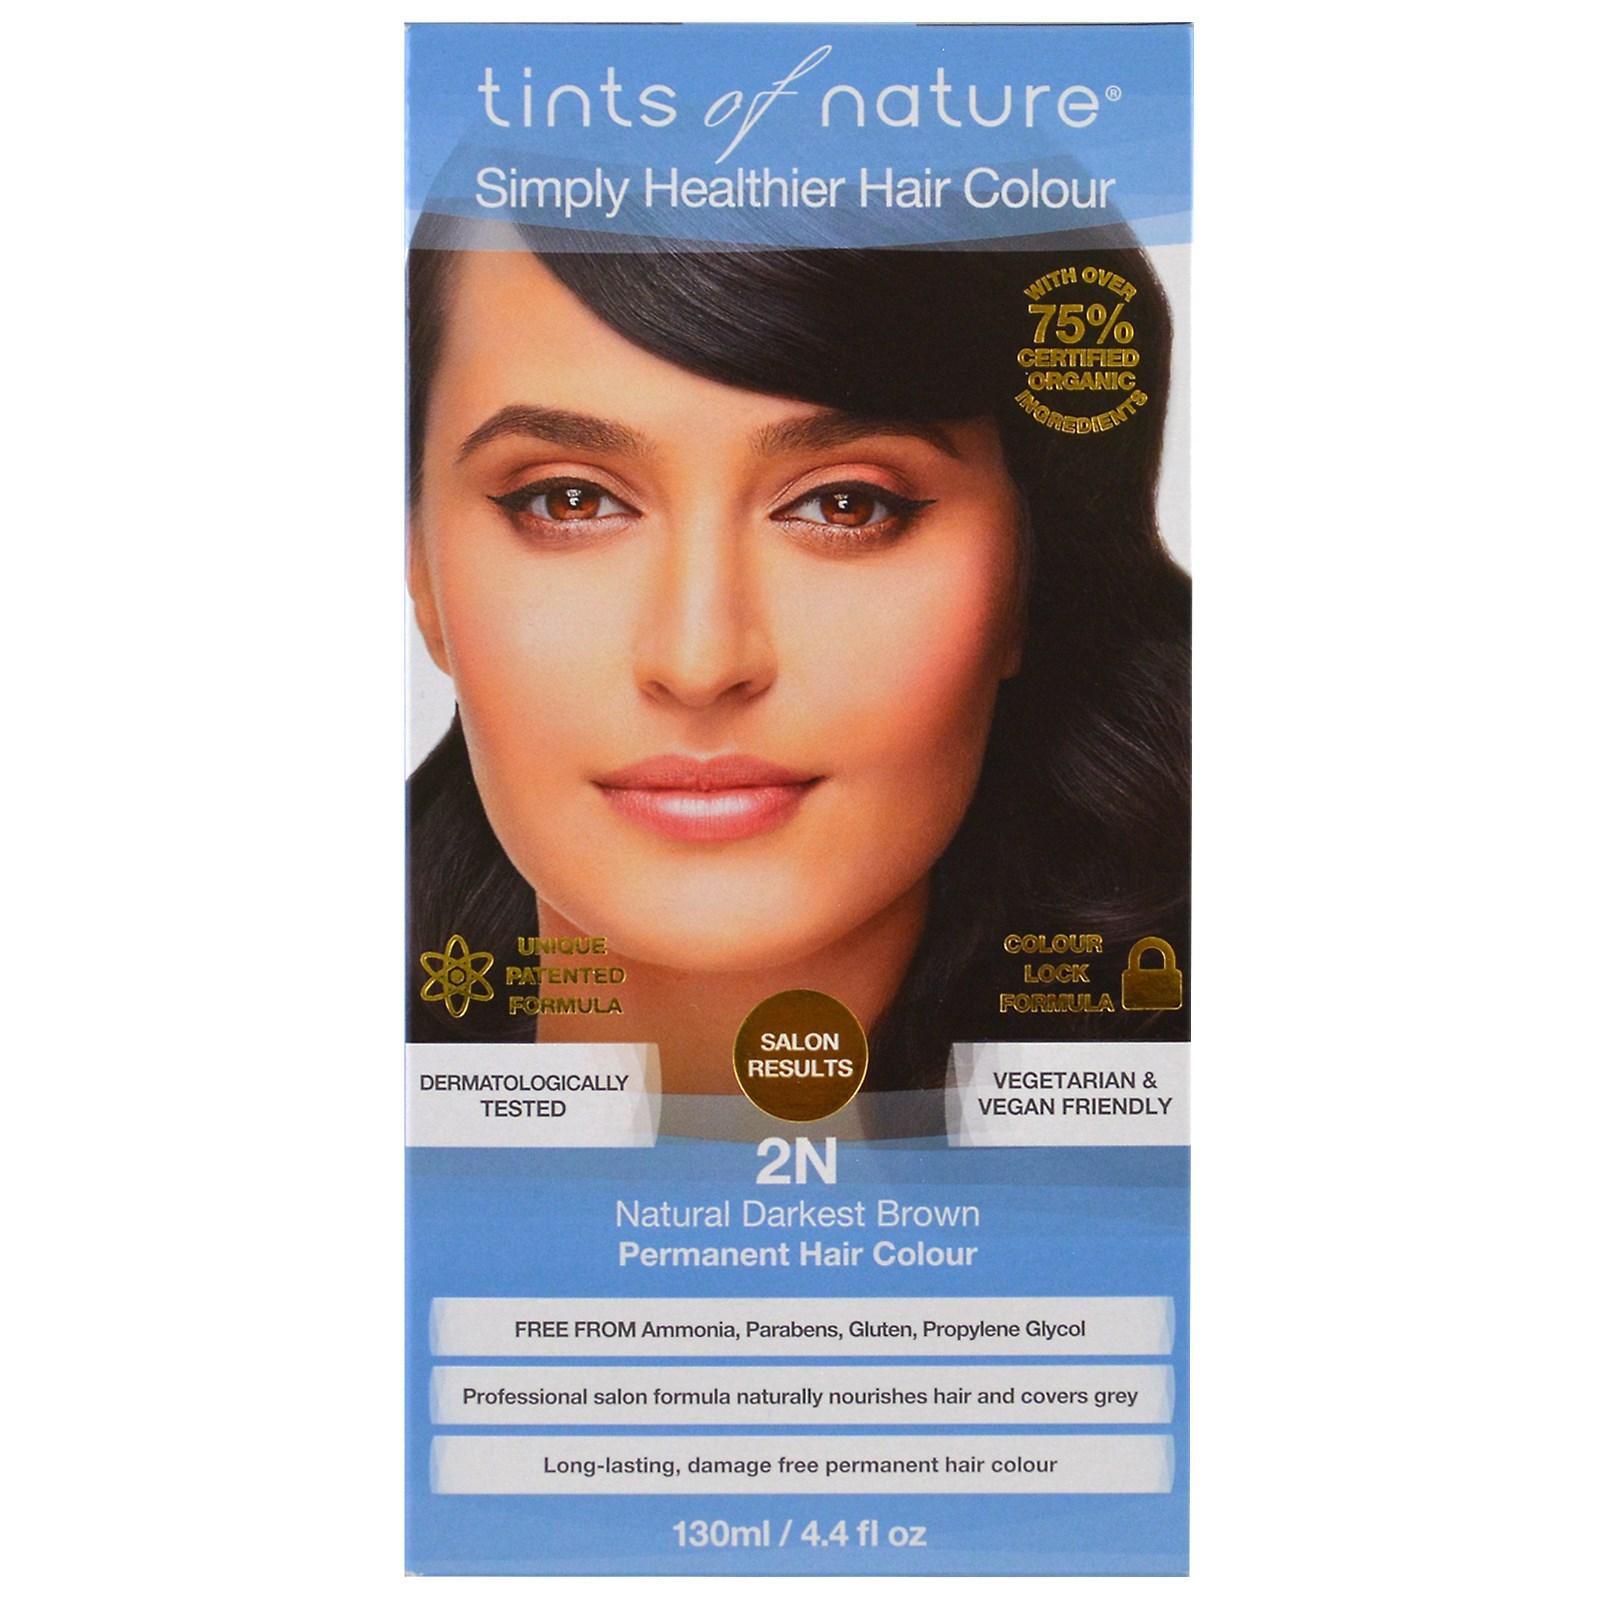 Tints Of Nature Permanent Hair Color Natural Darkest Brown 2n